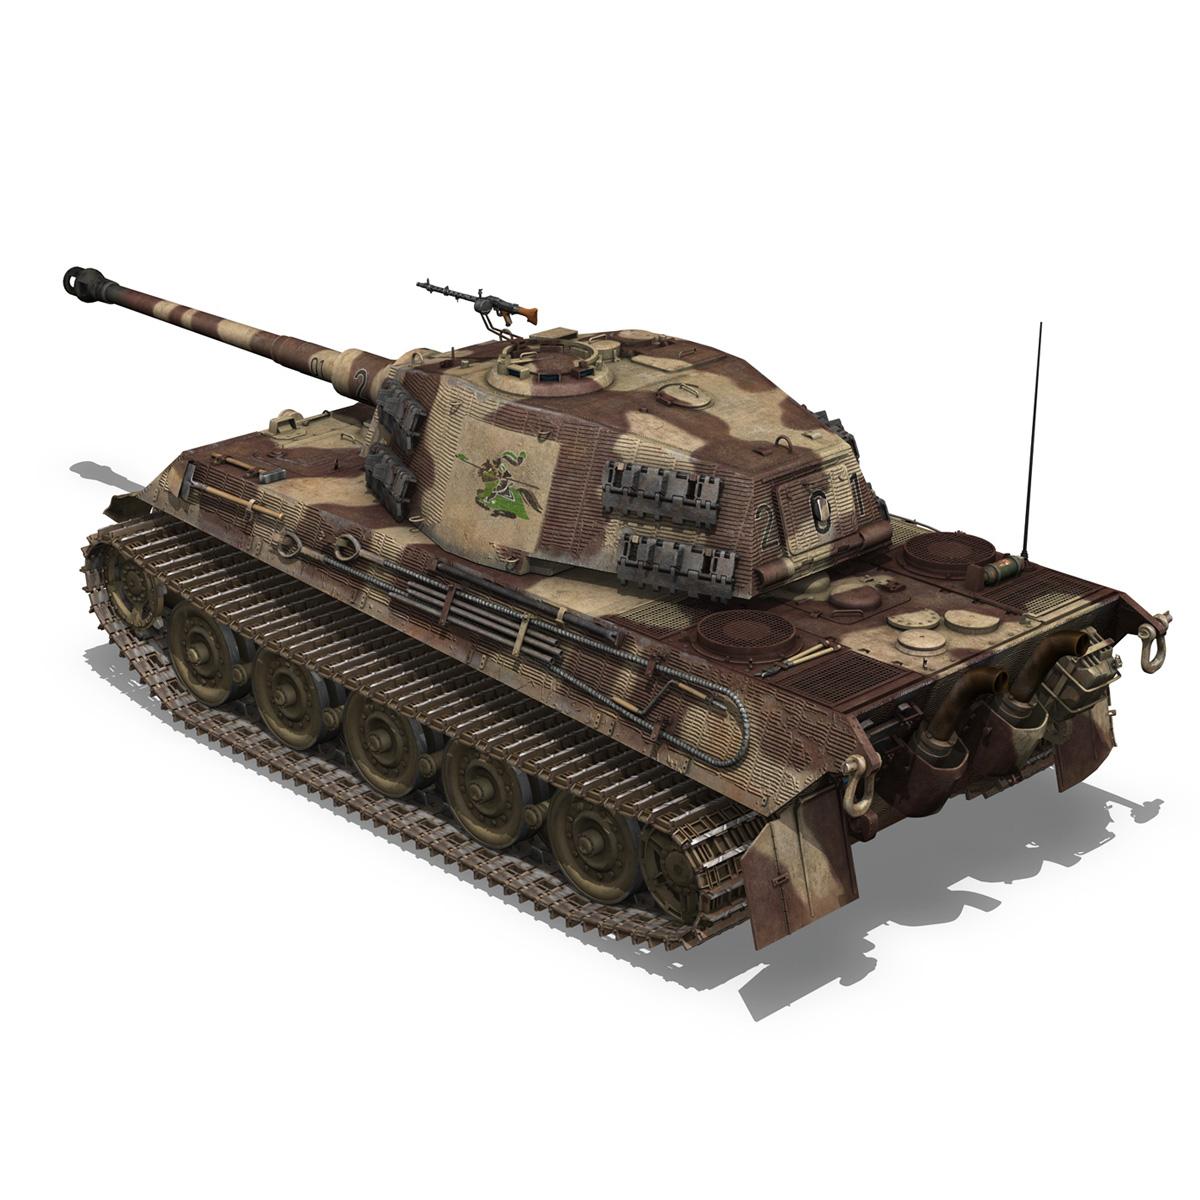 panzerkampfwagen vi – ausf b – tiger ii – 201 3d model 3ds c4d lwo lw lws obj 293305